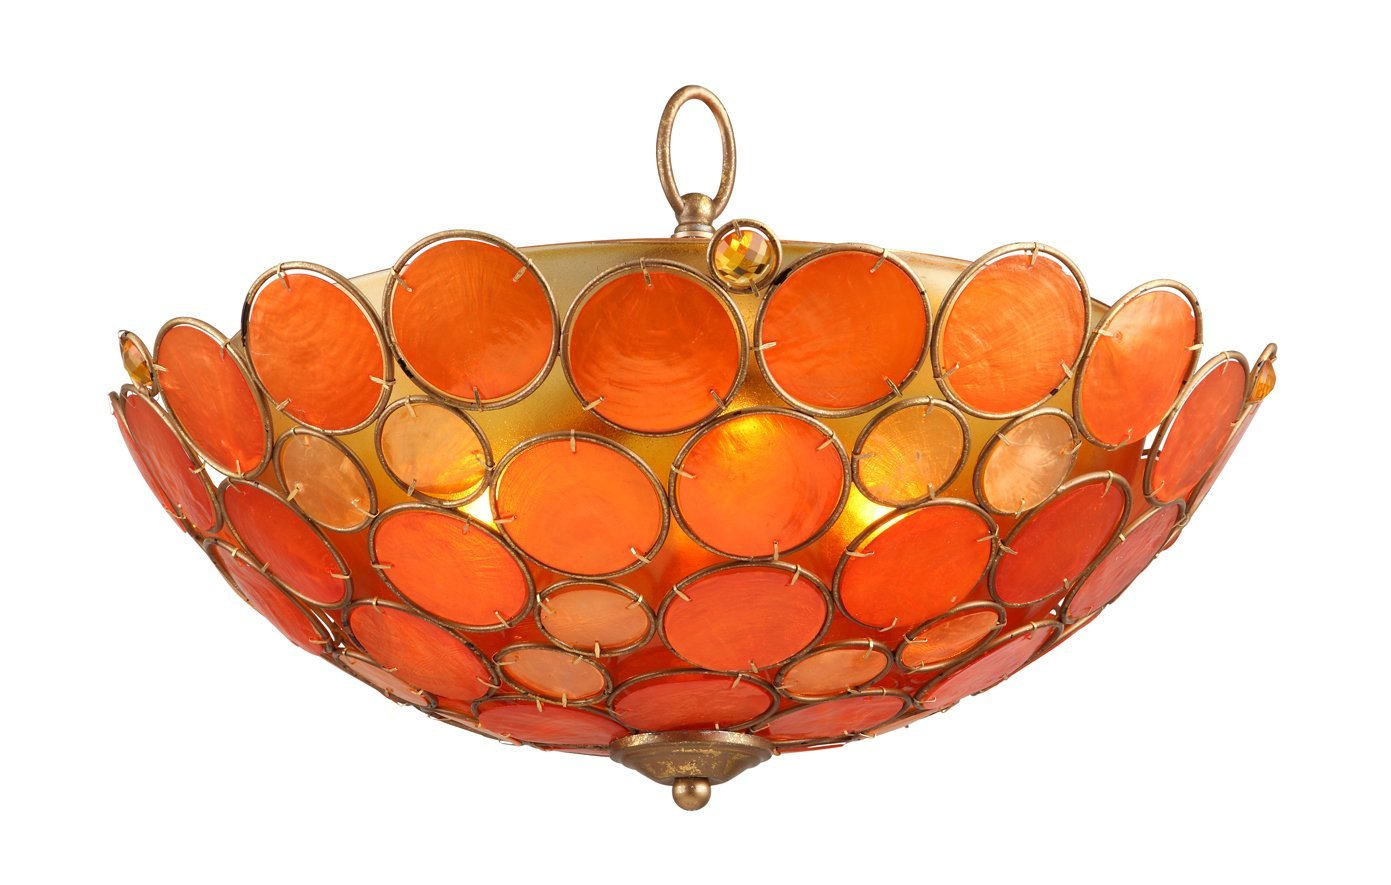 OK LIGHTING OK-5119-H1 H Capiz Shell Ceiling Lamp, 11-Inch, Antique Copper